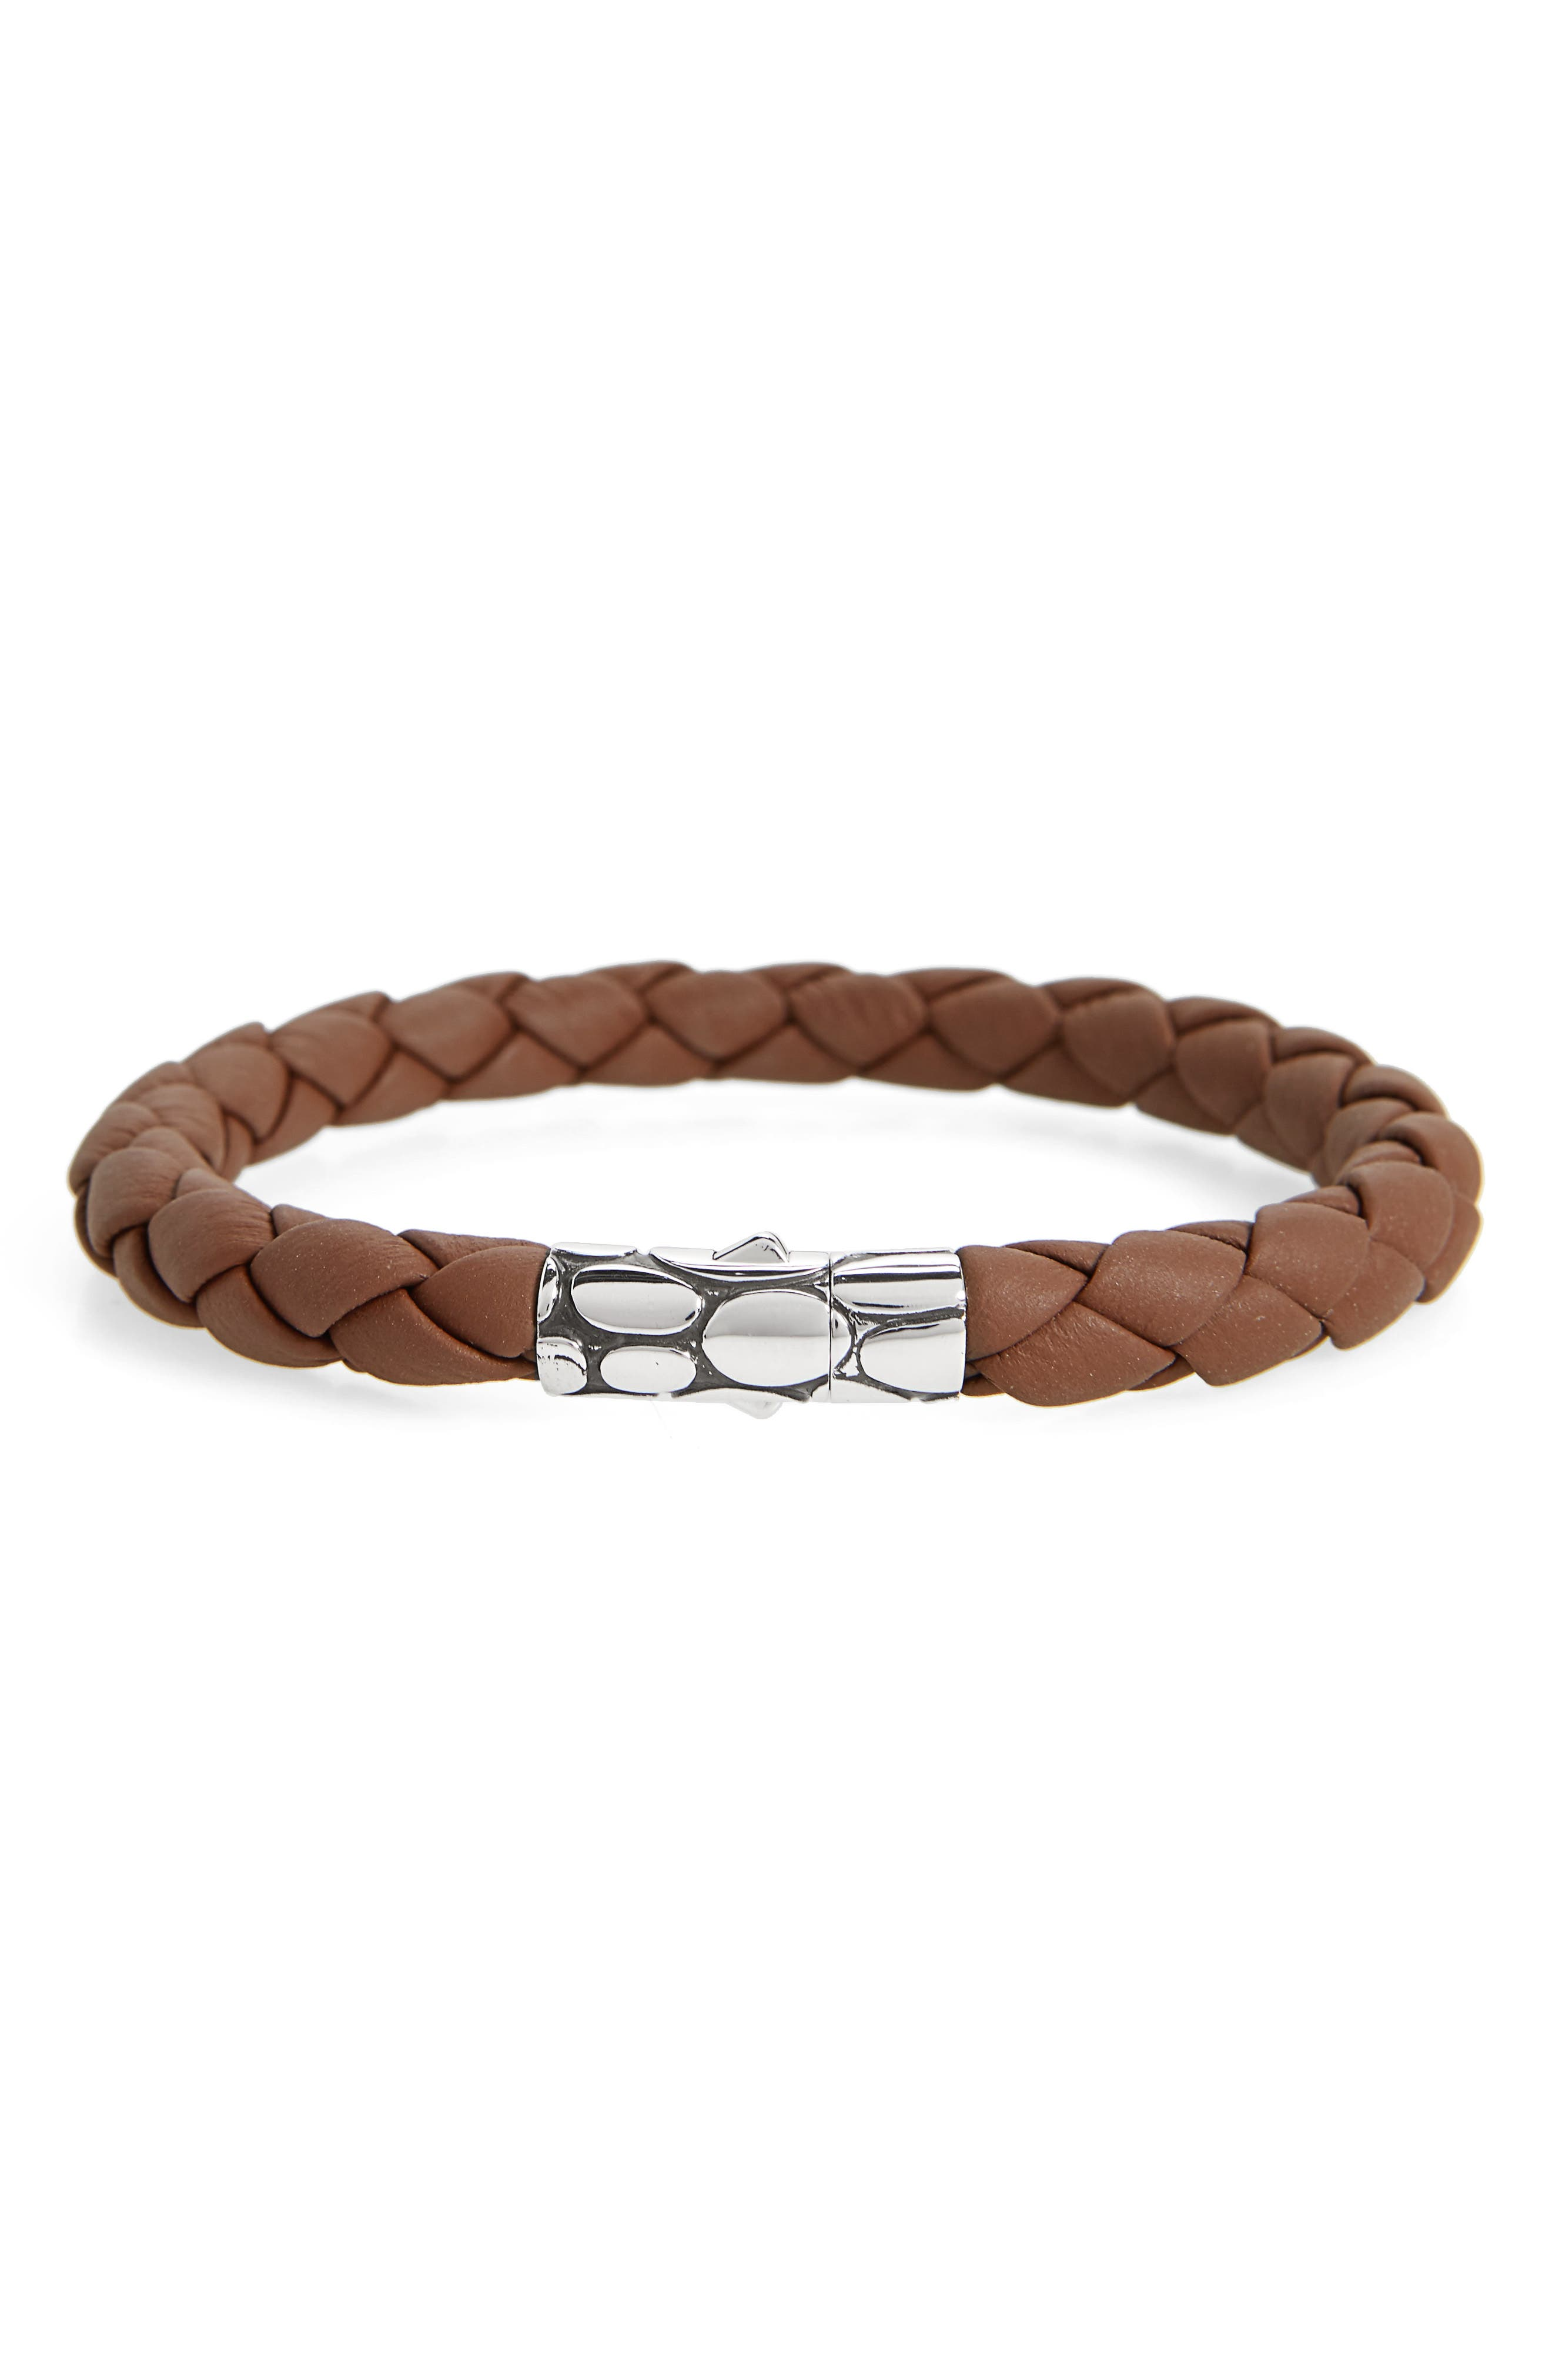 'Kali' Leather Bracelet,                             Main thumbnail 1, color,                             SILVER/ BROWN